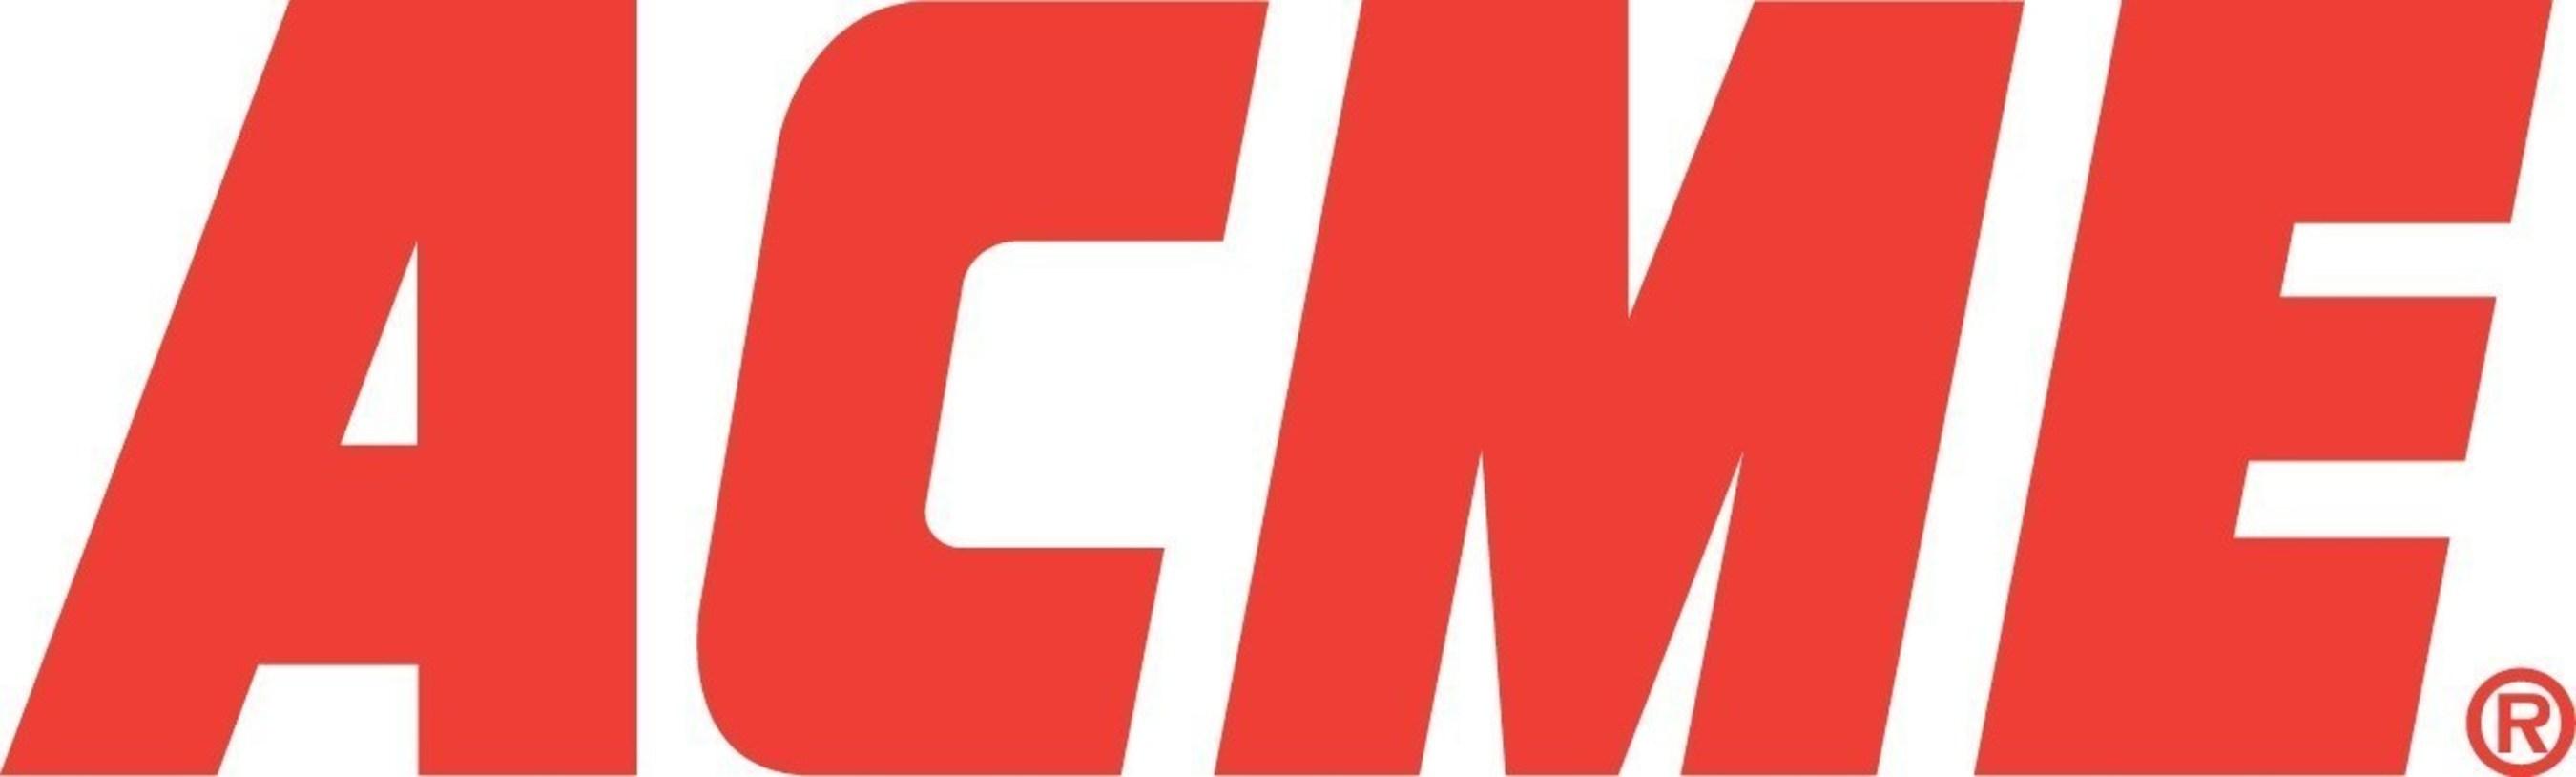 Acme Markets Announces Bid To Purchase 76 A P Stores